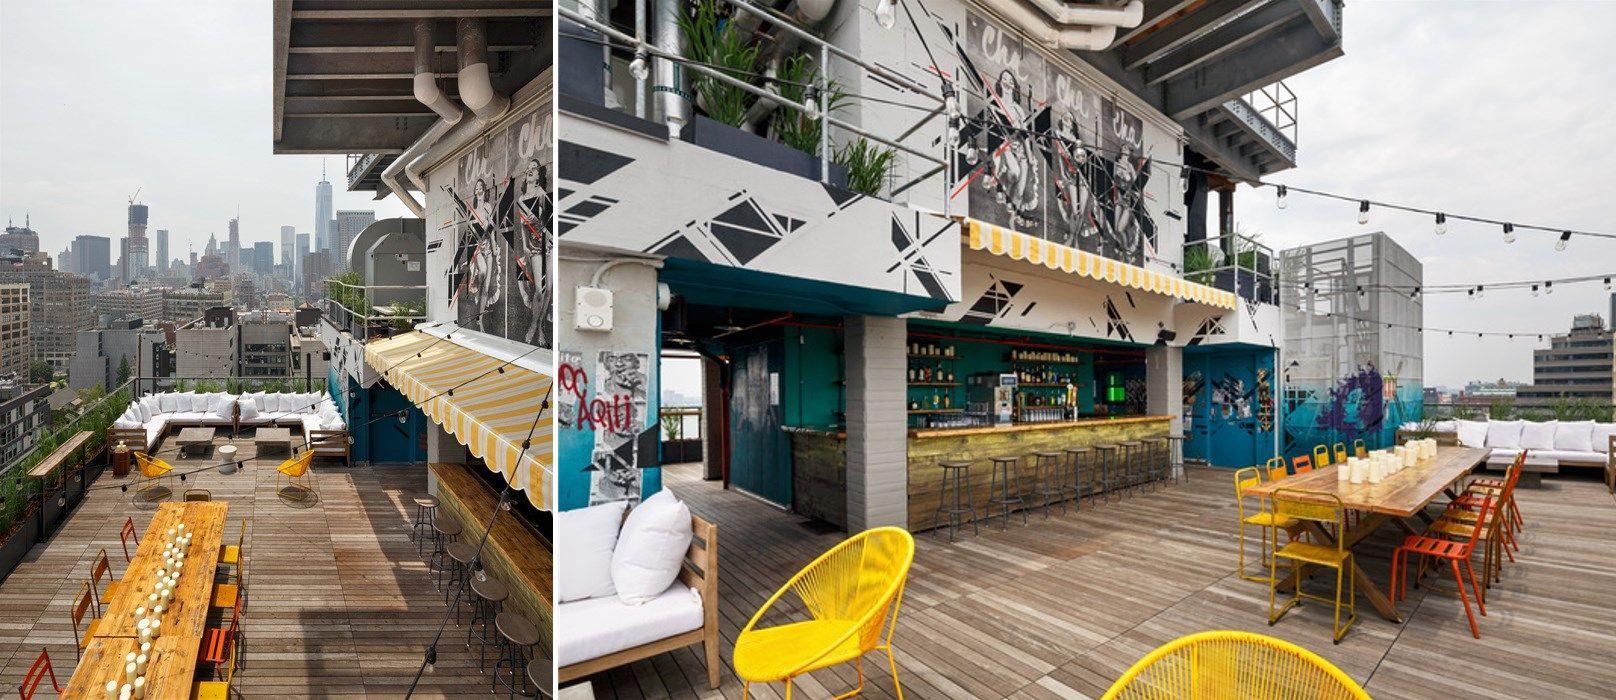 Hospitality Insatgram 3 Best Rooftop Bars Rooftop Bar New York Rooftop Bar